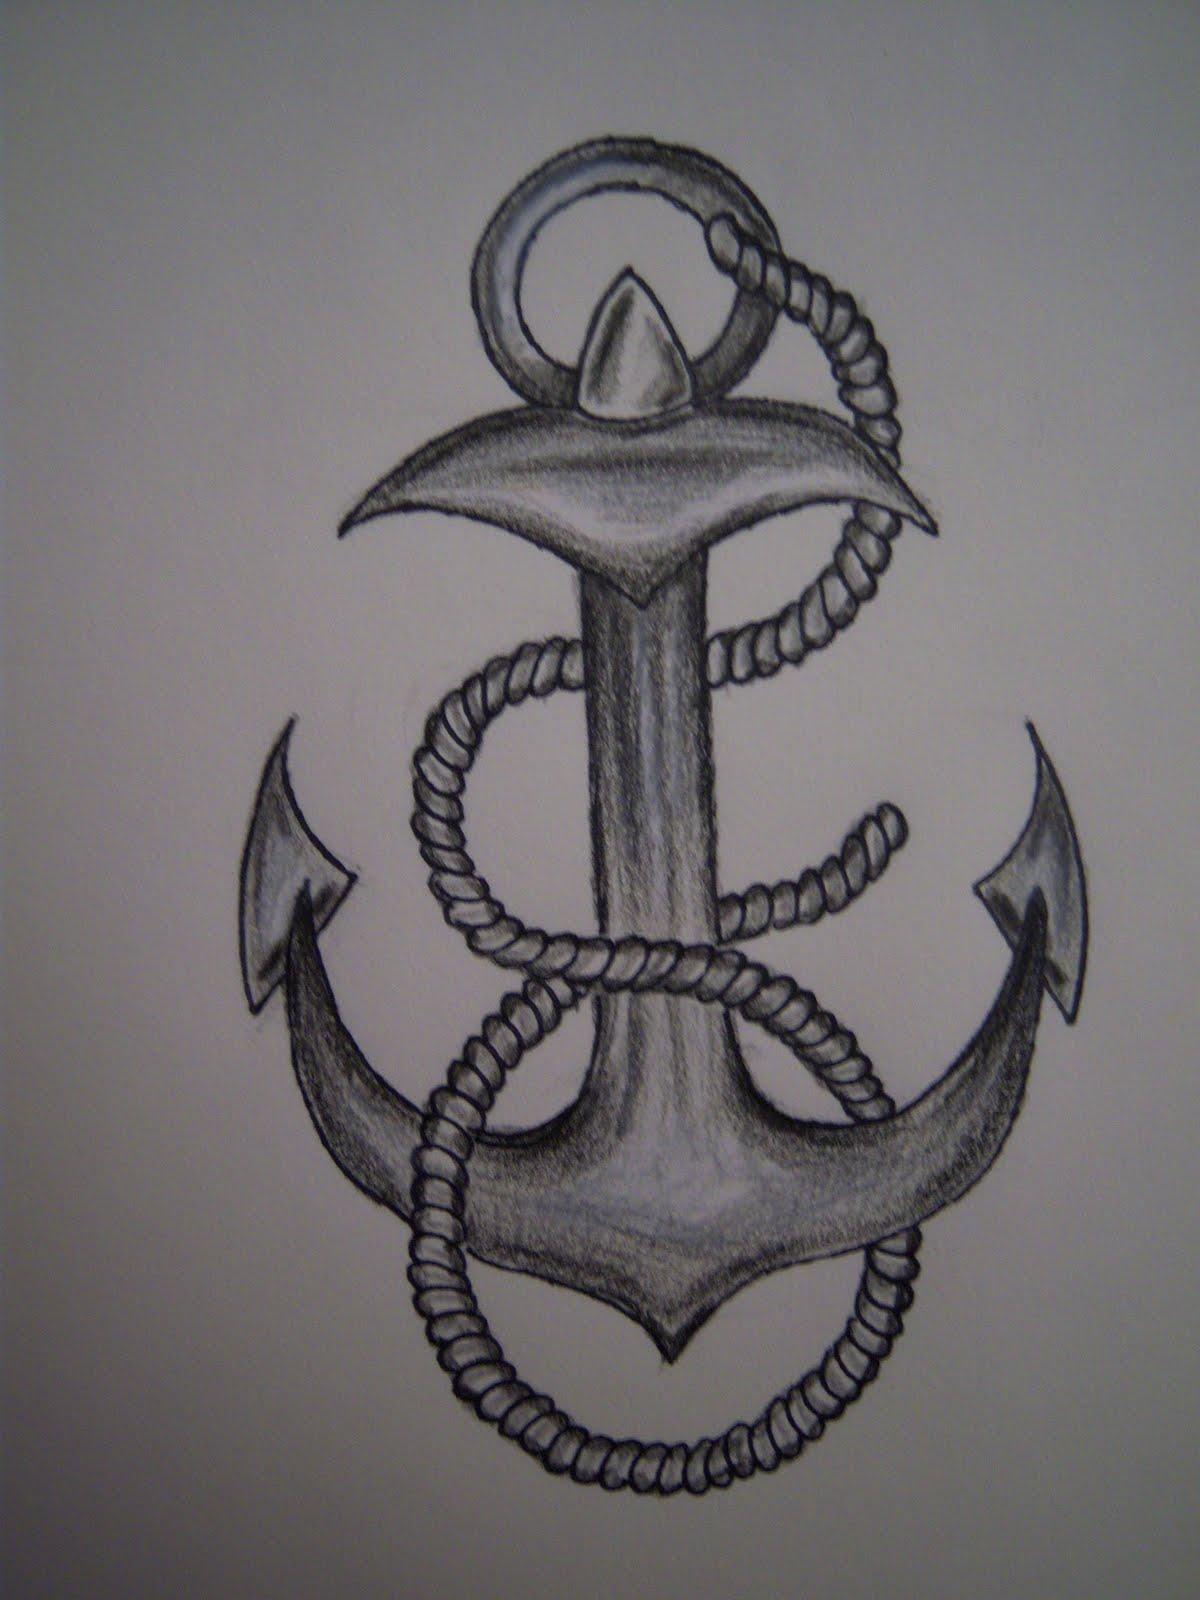 Hook tattoo designs - Anchor Tattoos